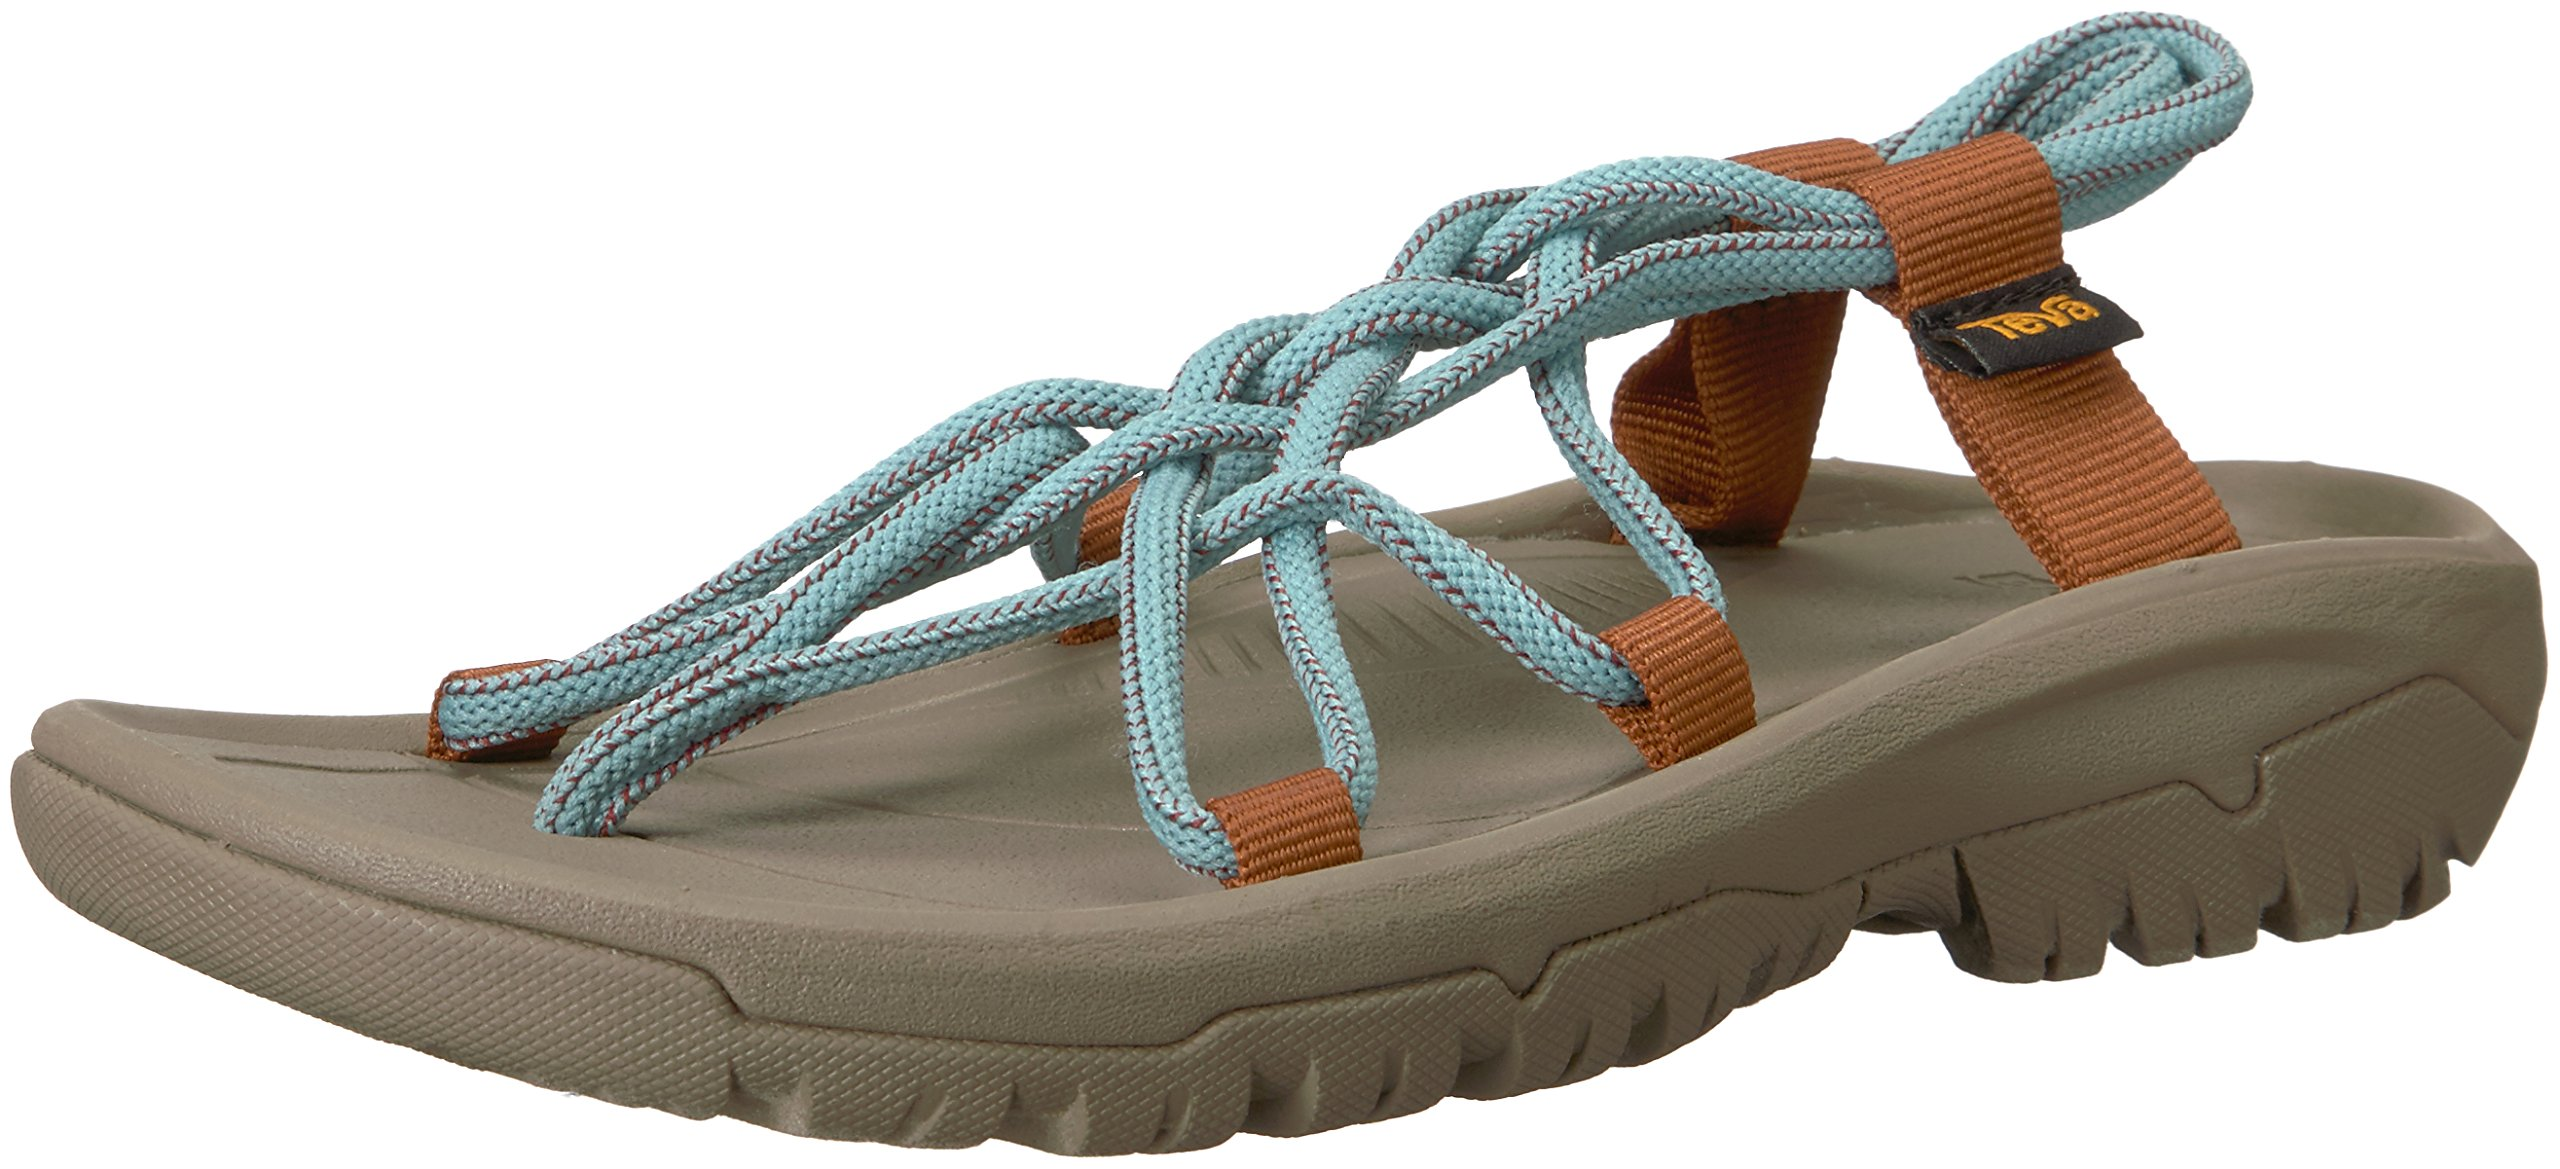 Teva Women's W Hurricane XLT Infinity Sport Sandal, Sea Glass, 9 M US